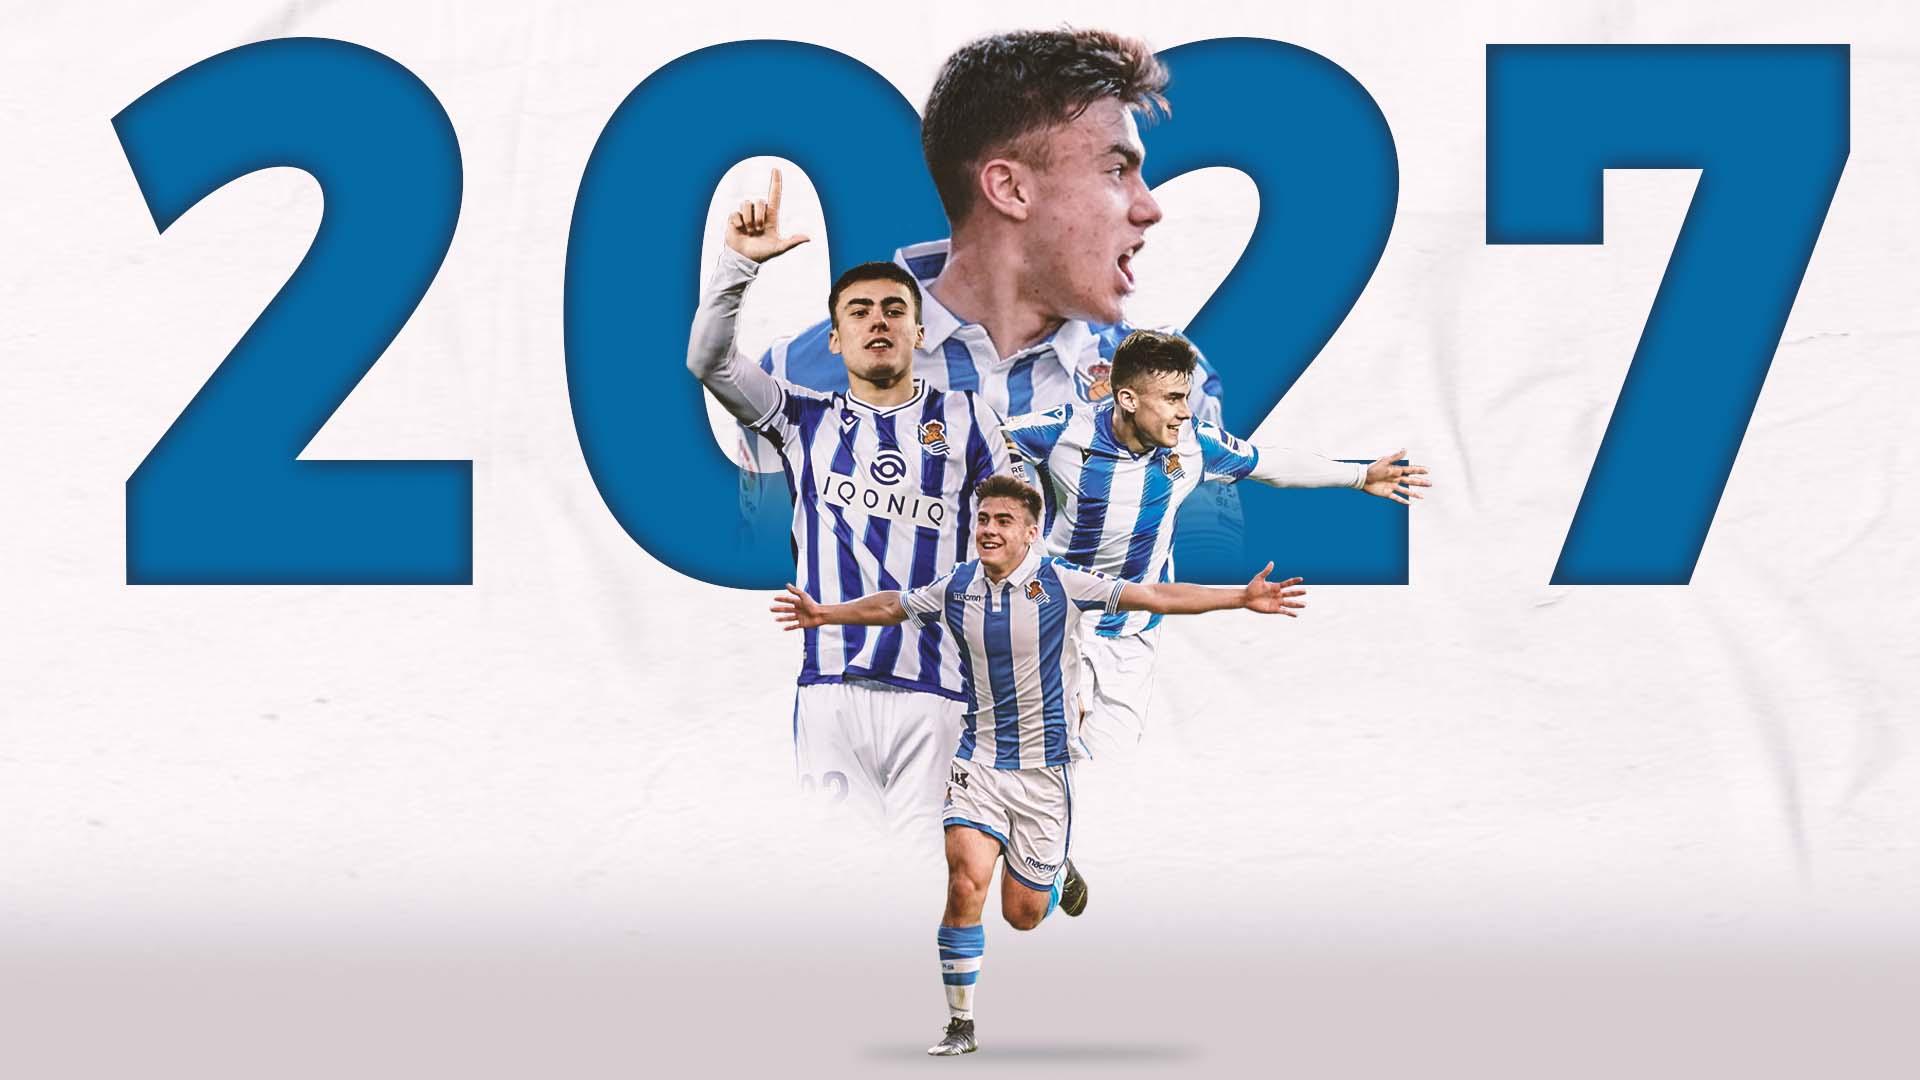 Ander Barrenetxea signs new Real Sociedad contract until 2027